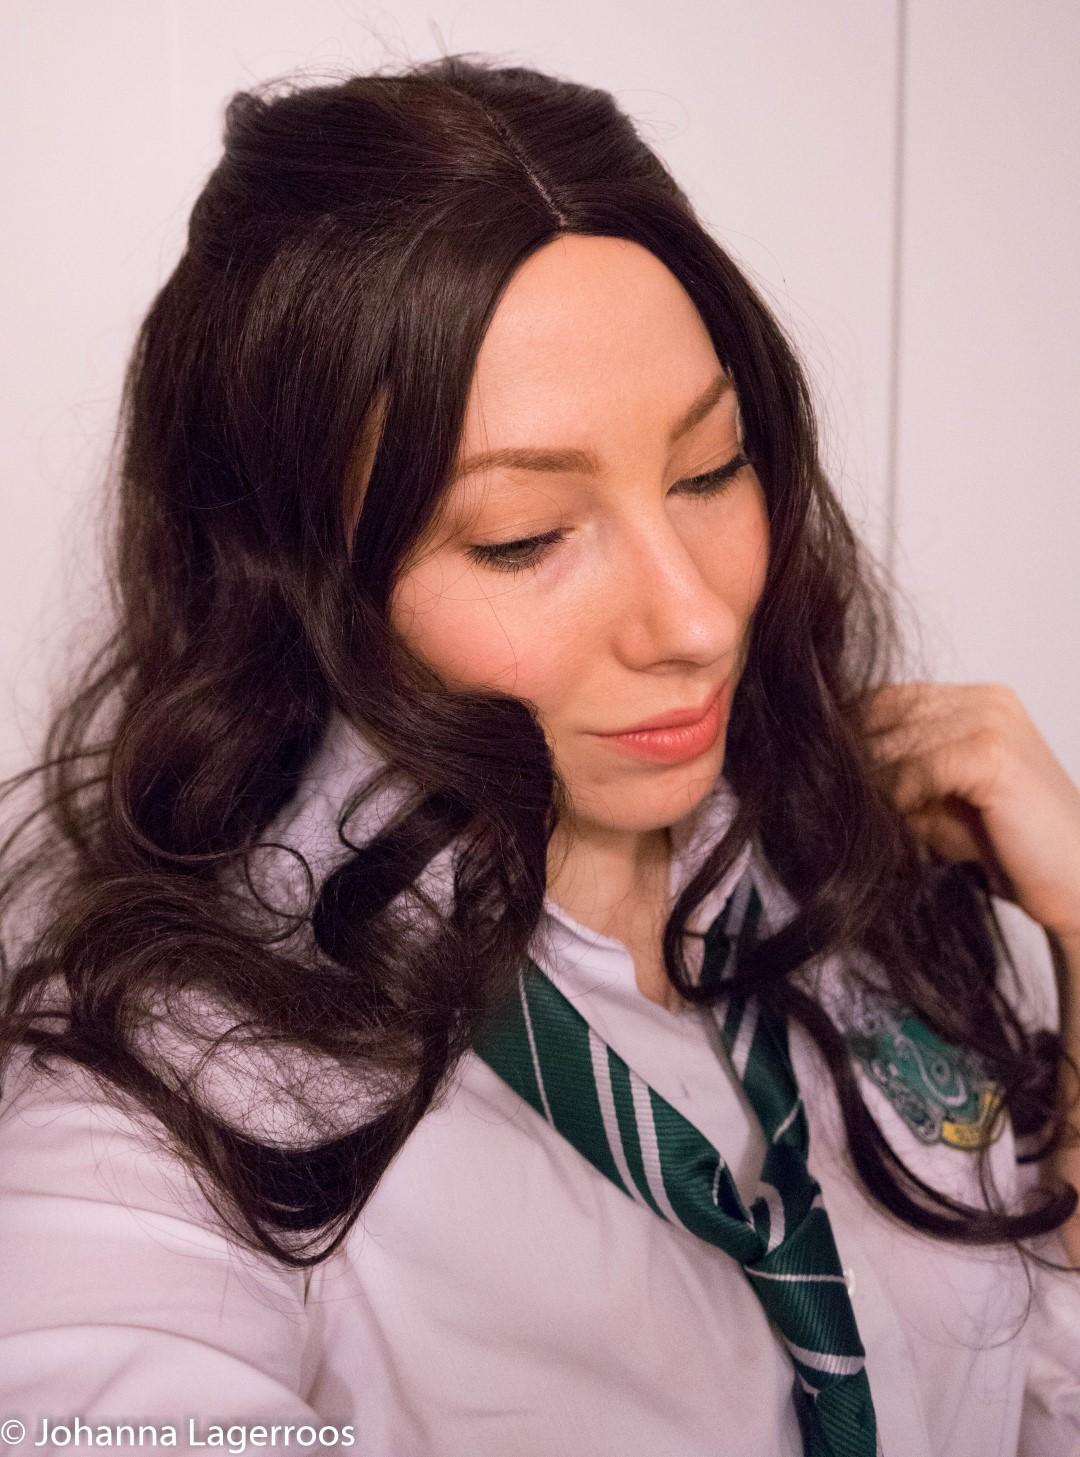 Hogwarts student makeup